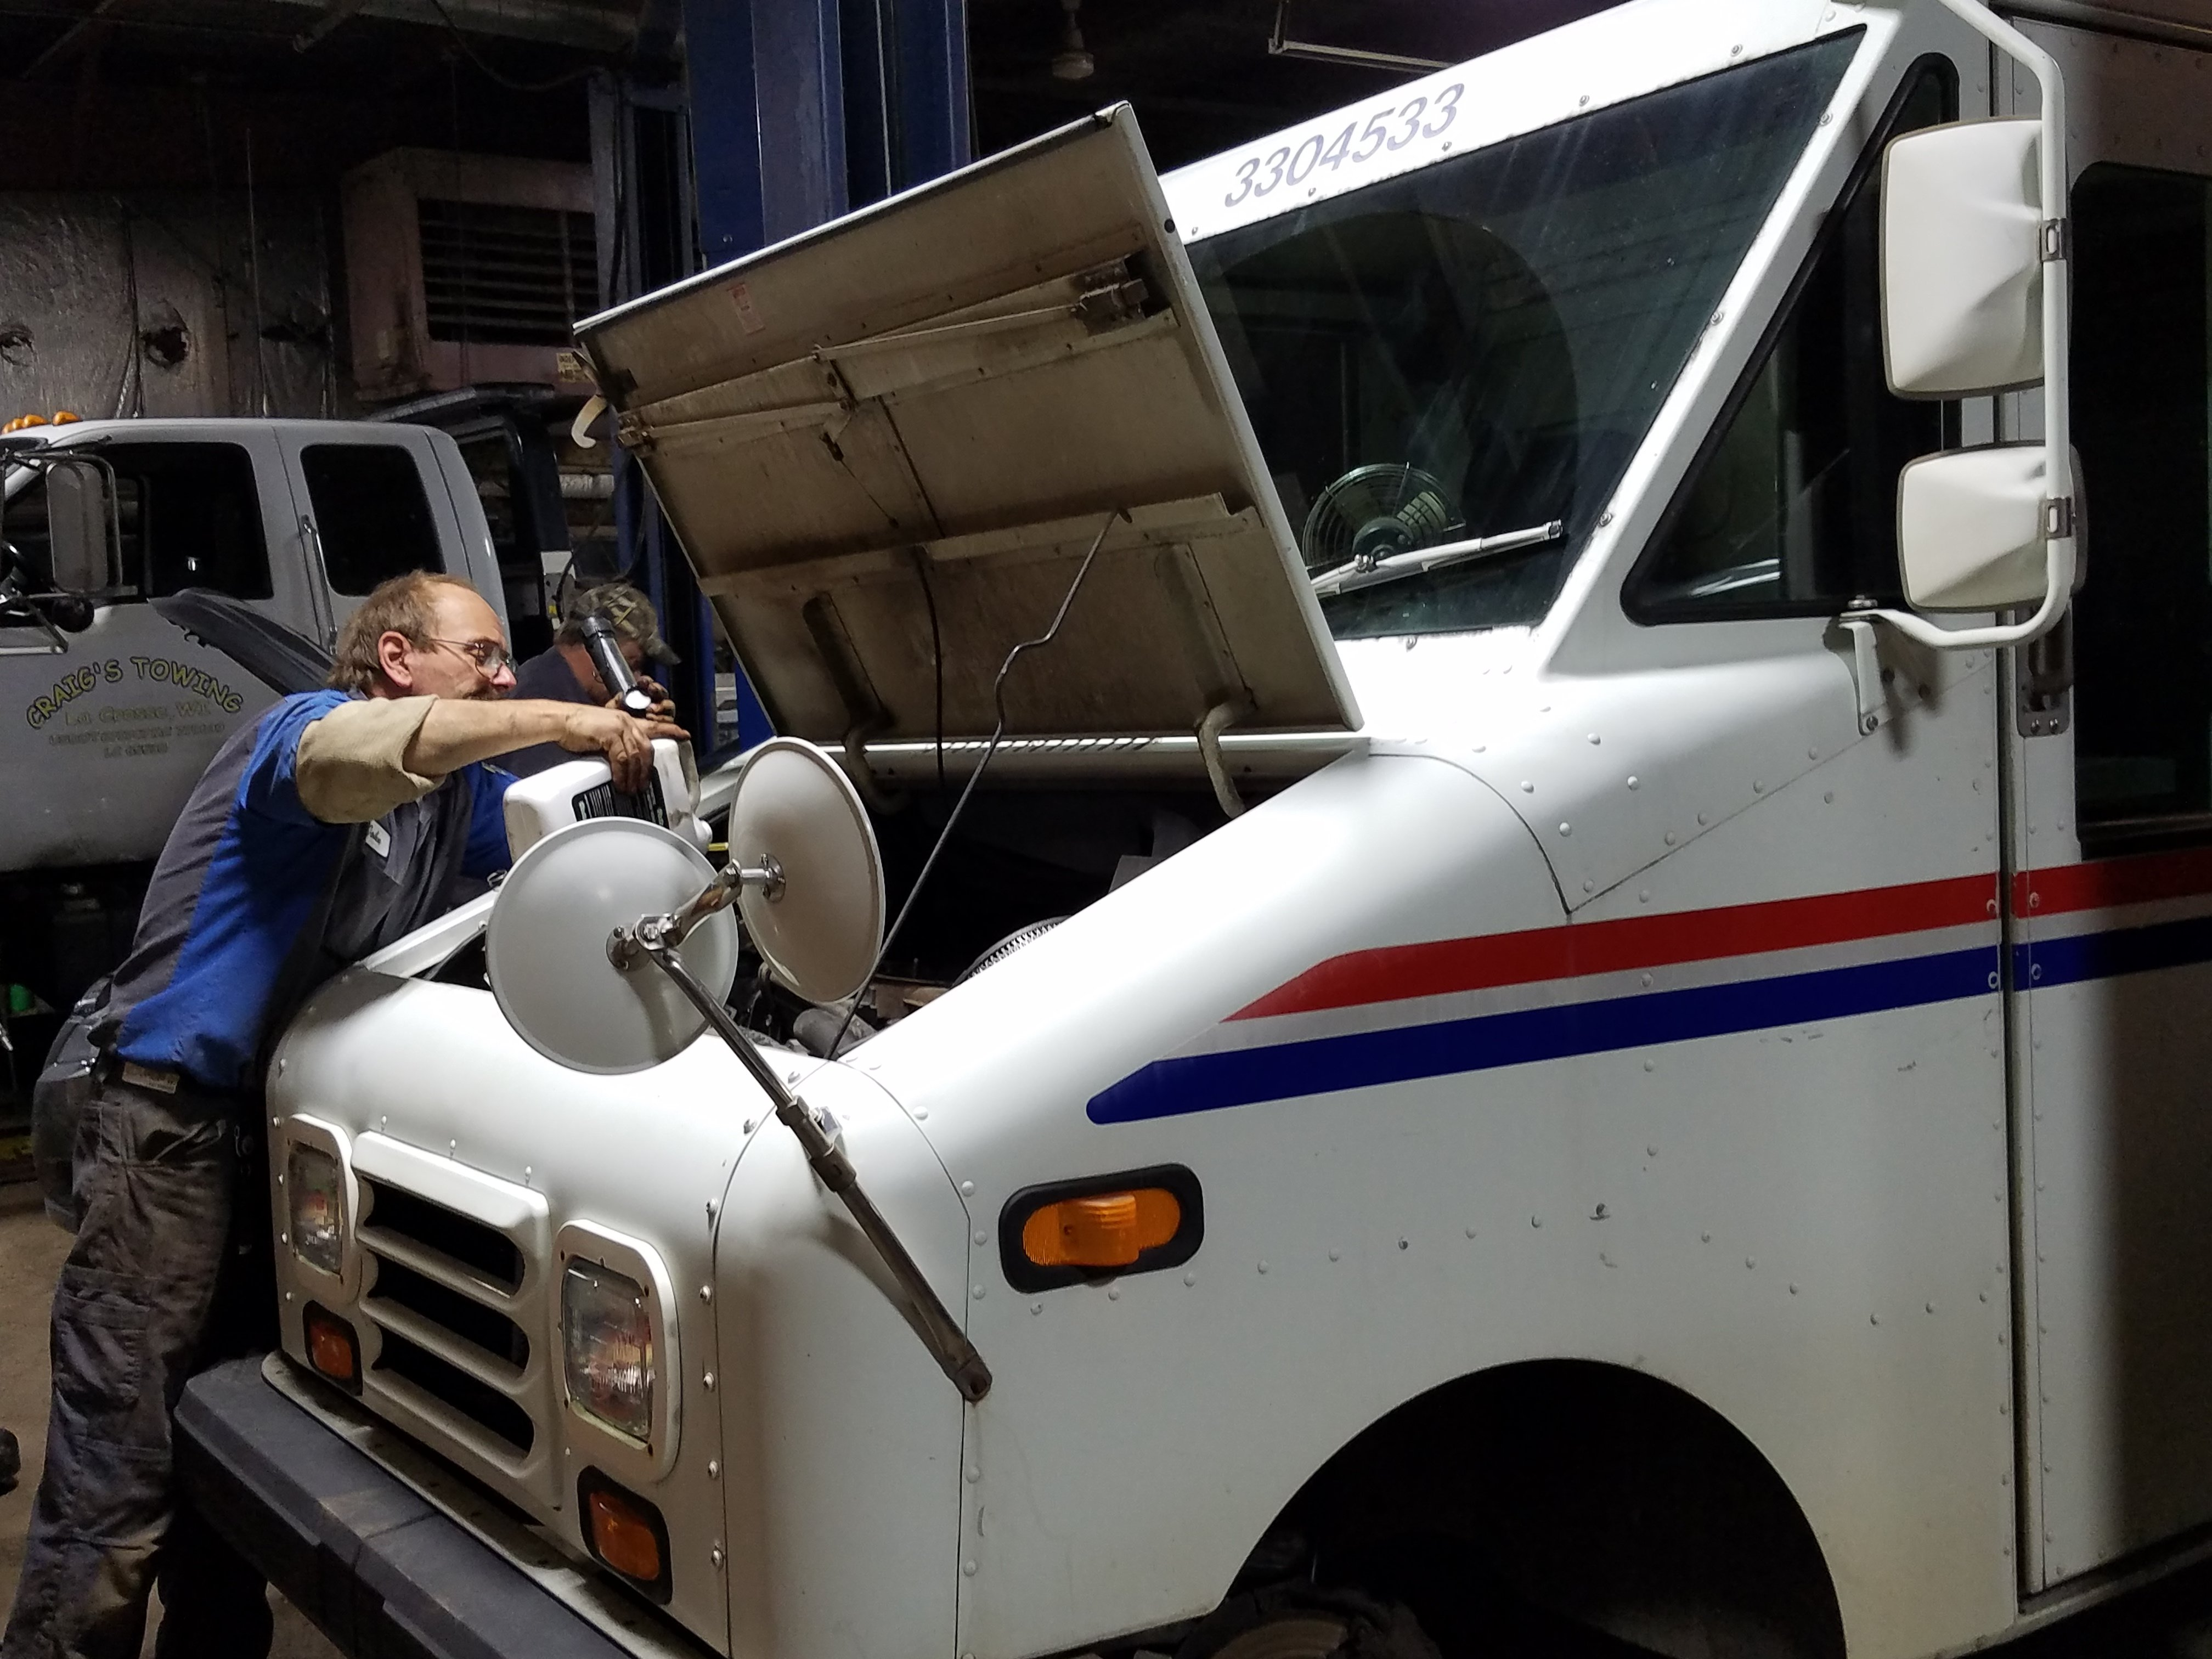 Mechanic working on a USPS vehicle